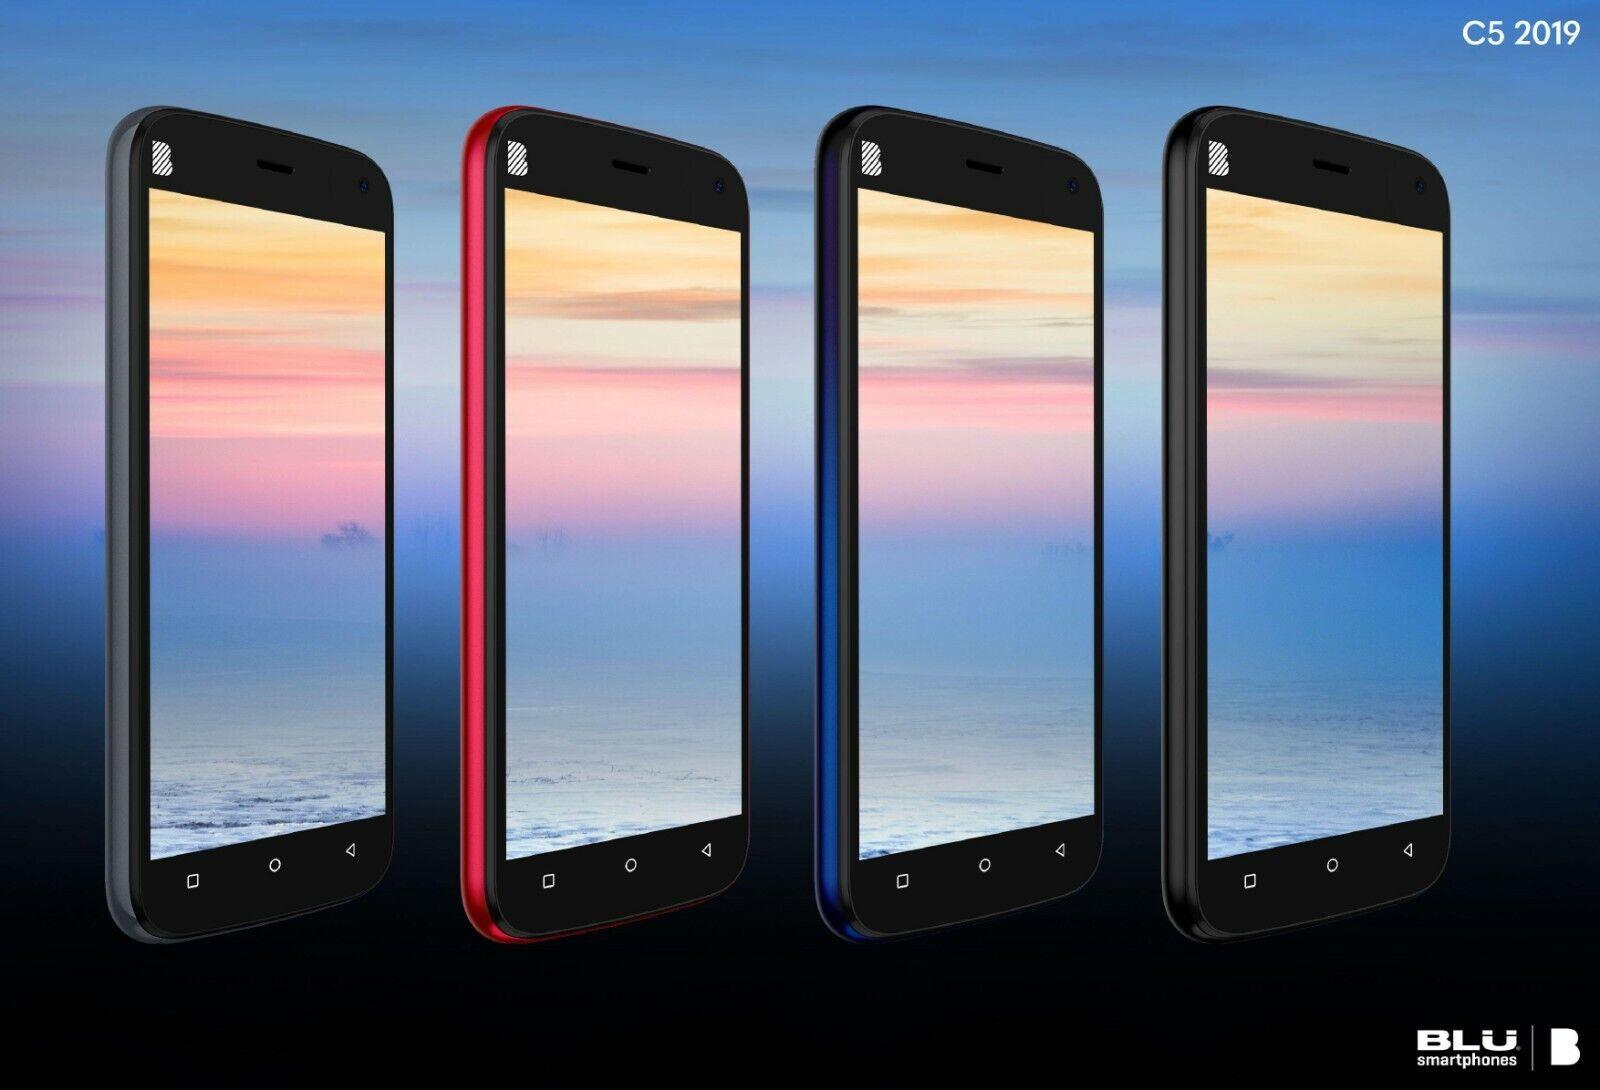 BLU C5 2019 5'' 4G Factory Unlocked Smart Phone Android 16GB